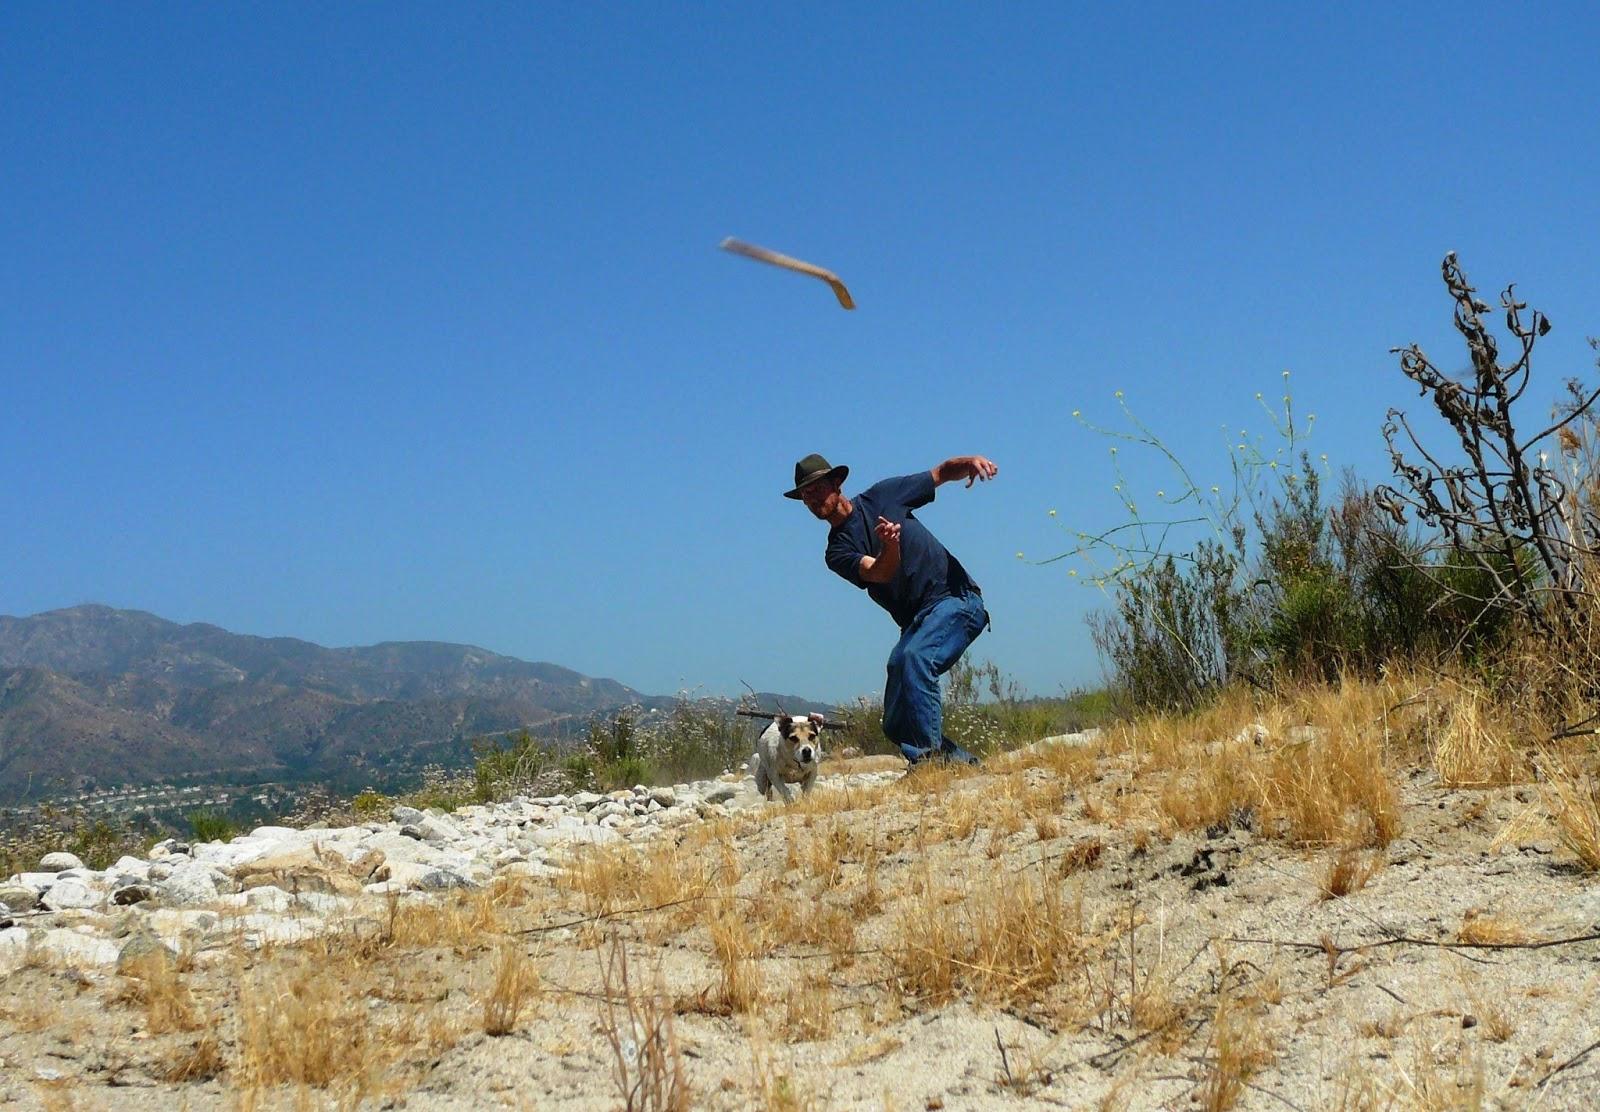 Countryman Foraging California S Wild Side Throwing